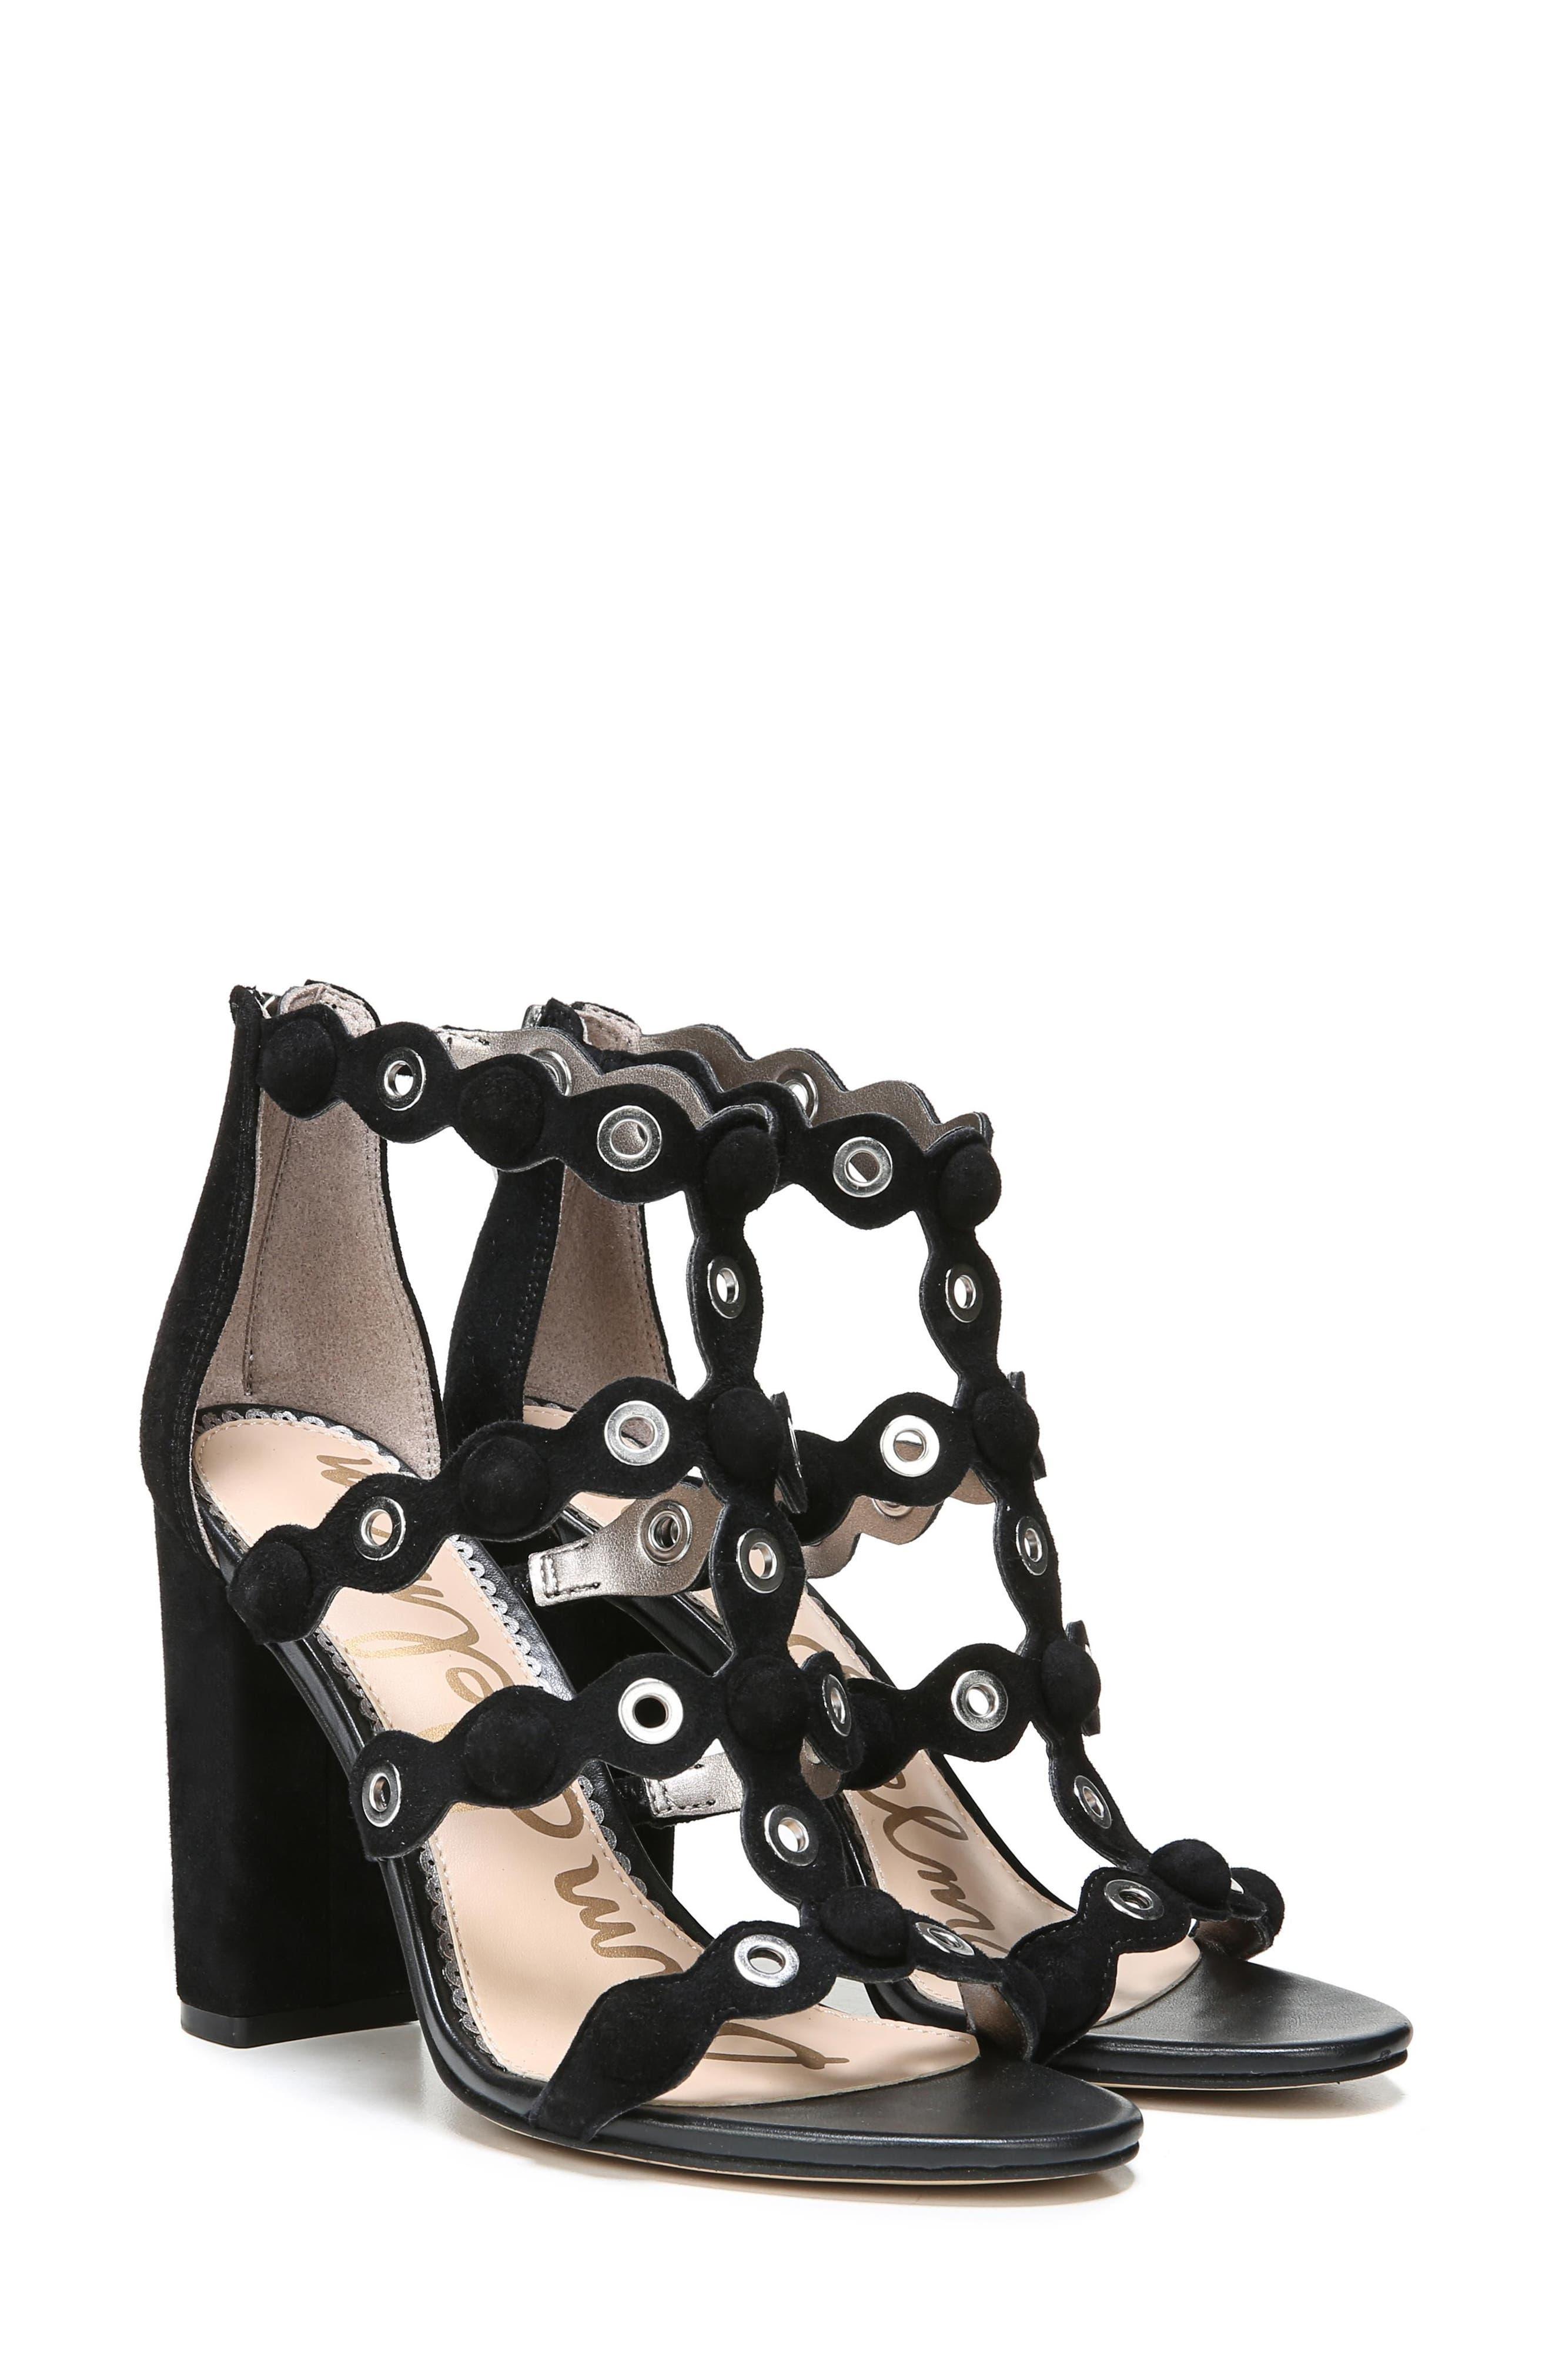 Yuli Grommet Sandal,                             Alternate thumbnail 8, color,                             BLACK LEATHER